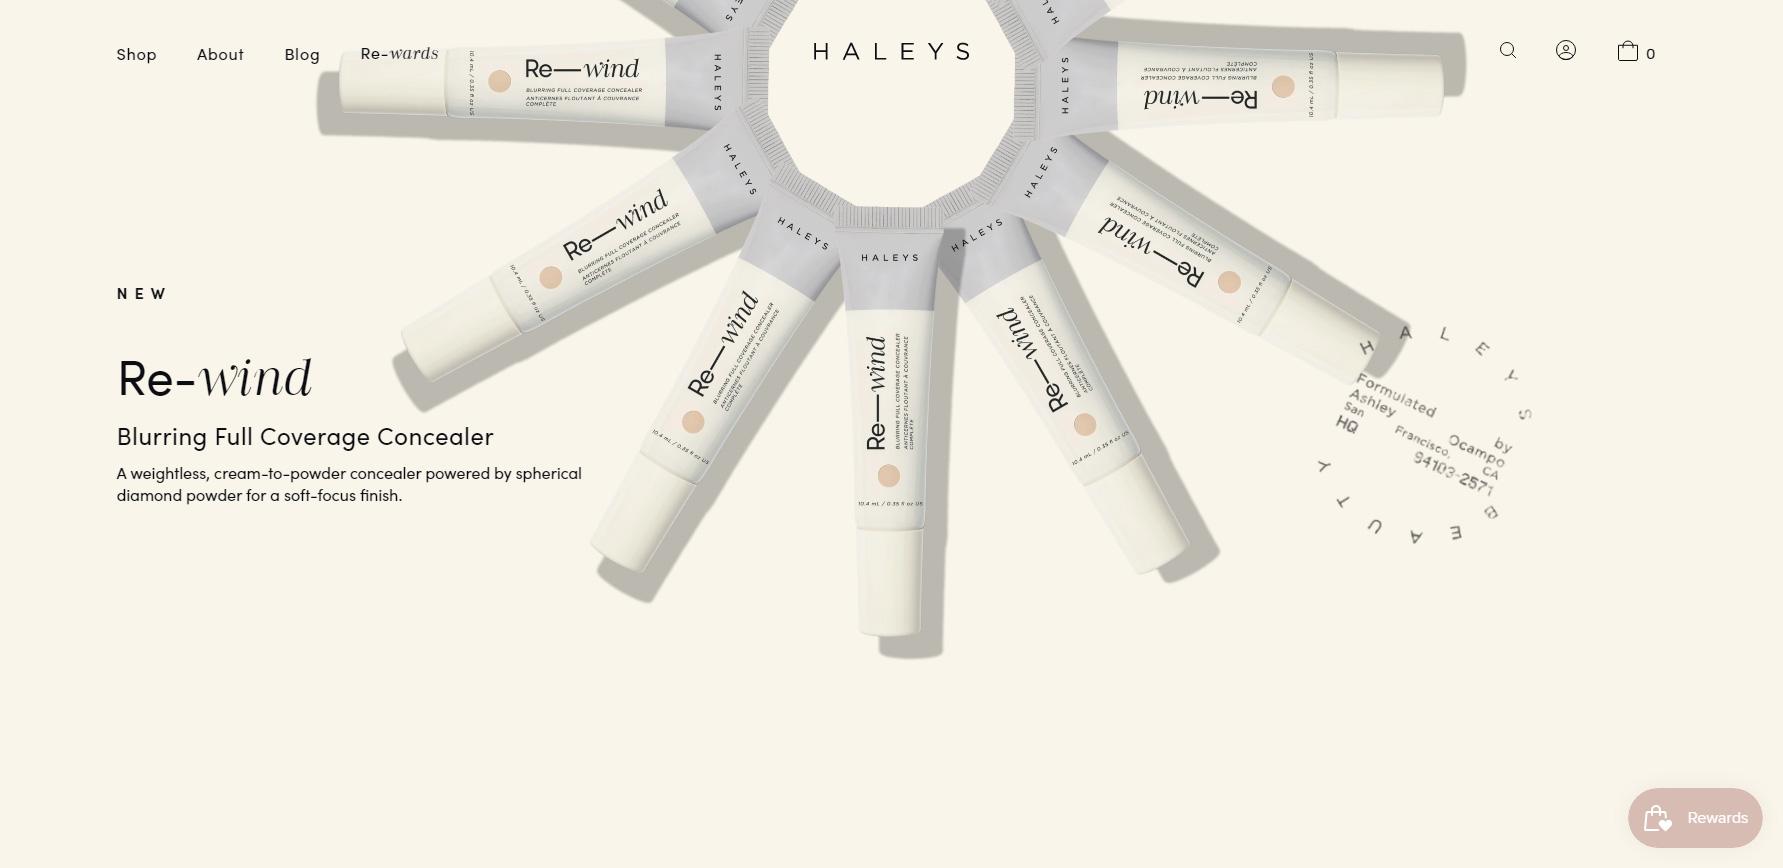 HALEYS BEAUTY - Website of the Day